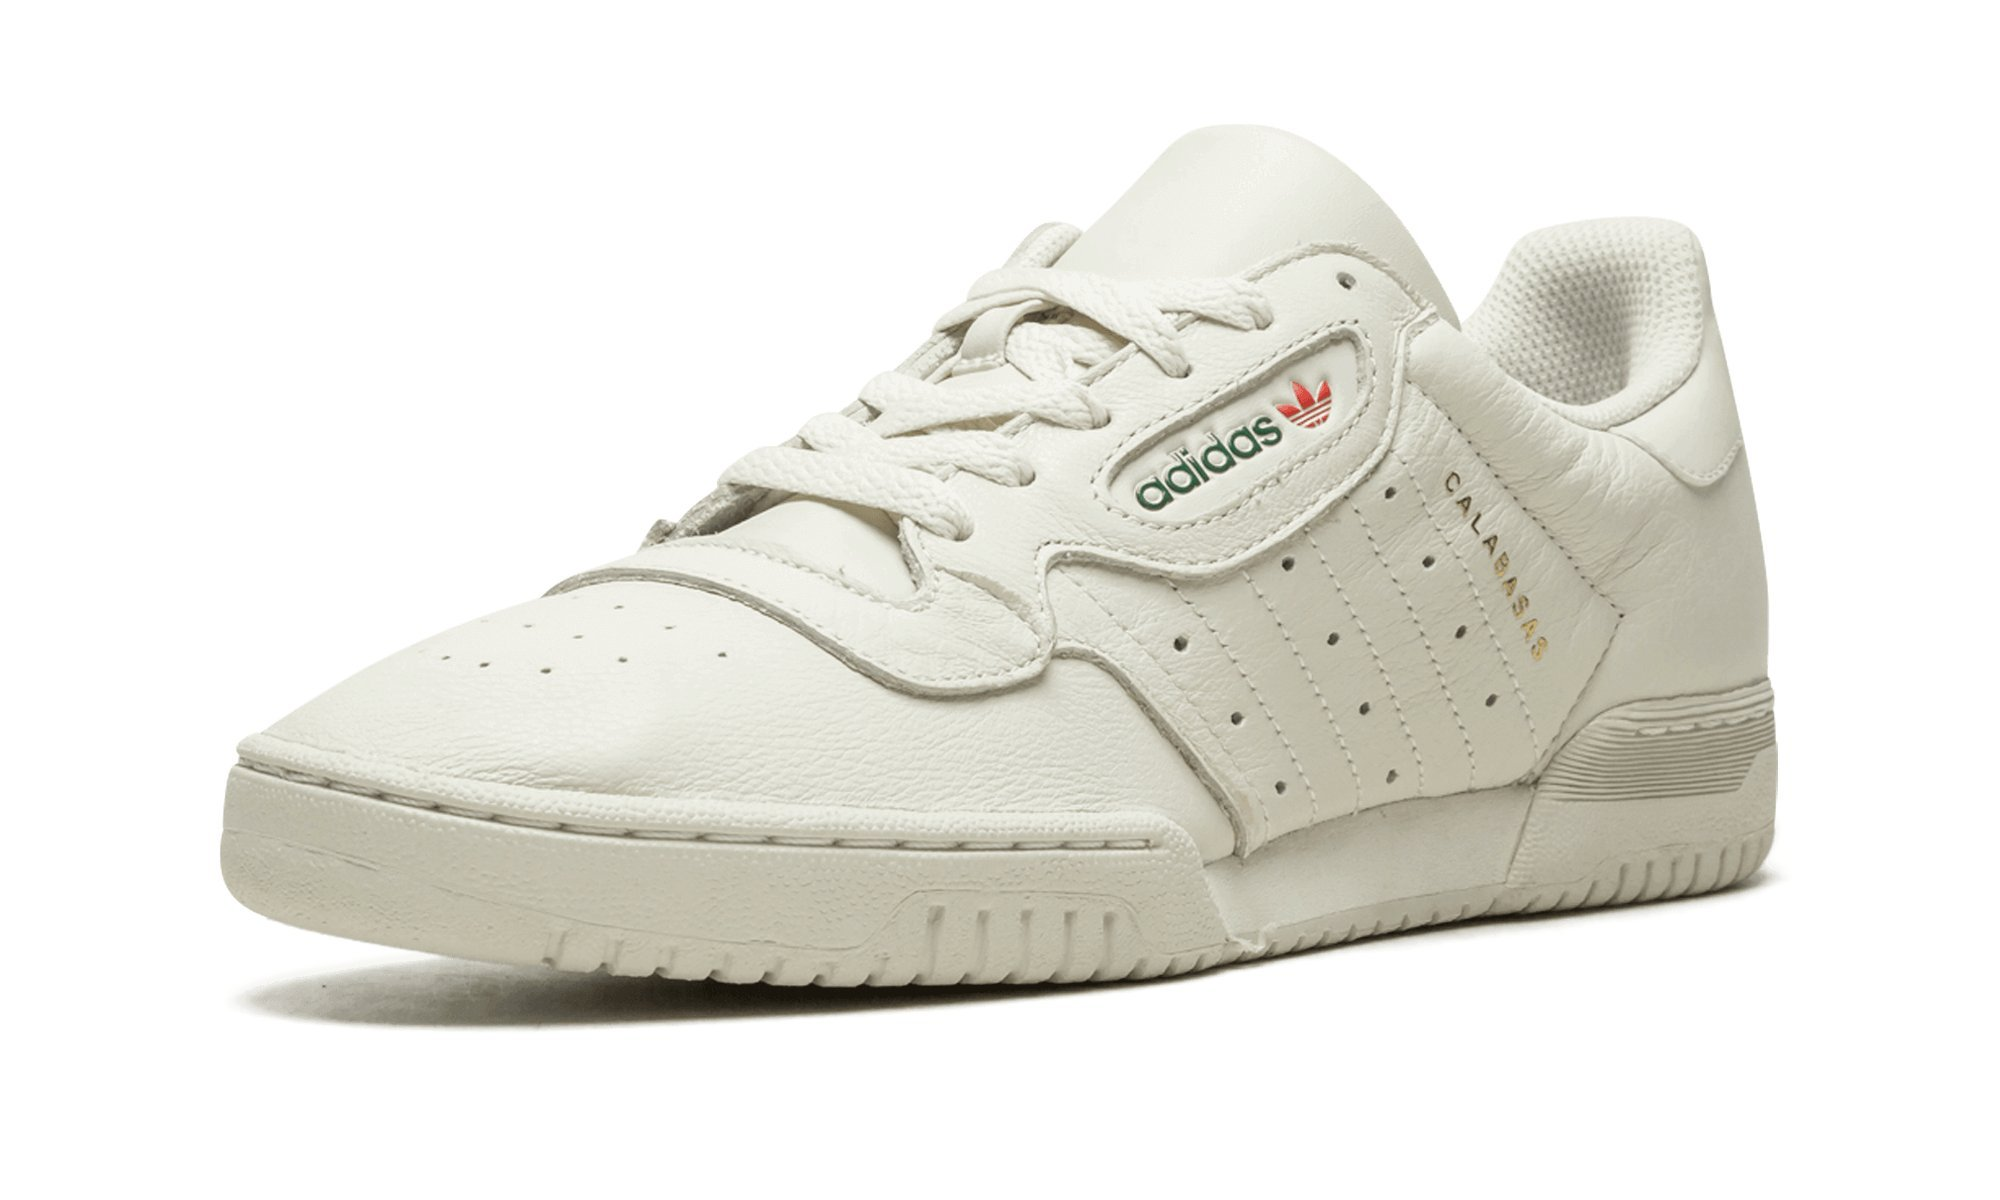 3eddc2961 Galleon - Adidas Yeezy Powerphase Calabasas - CQ1693